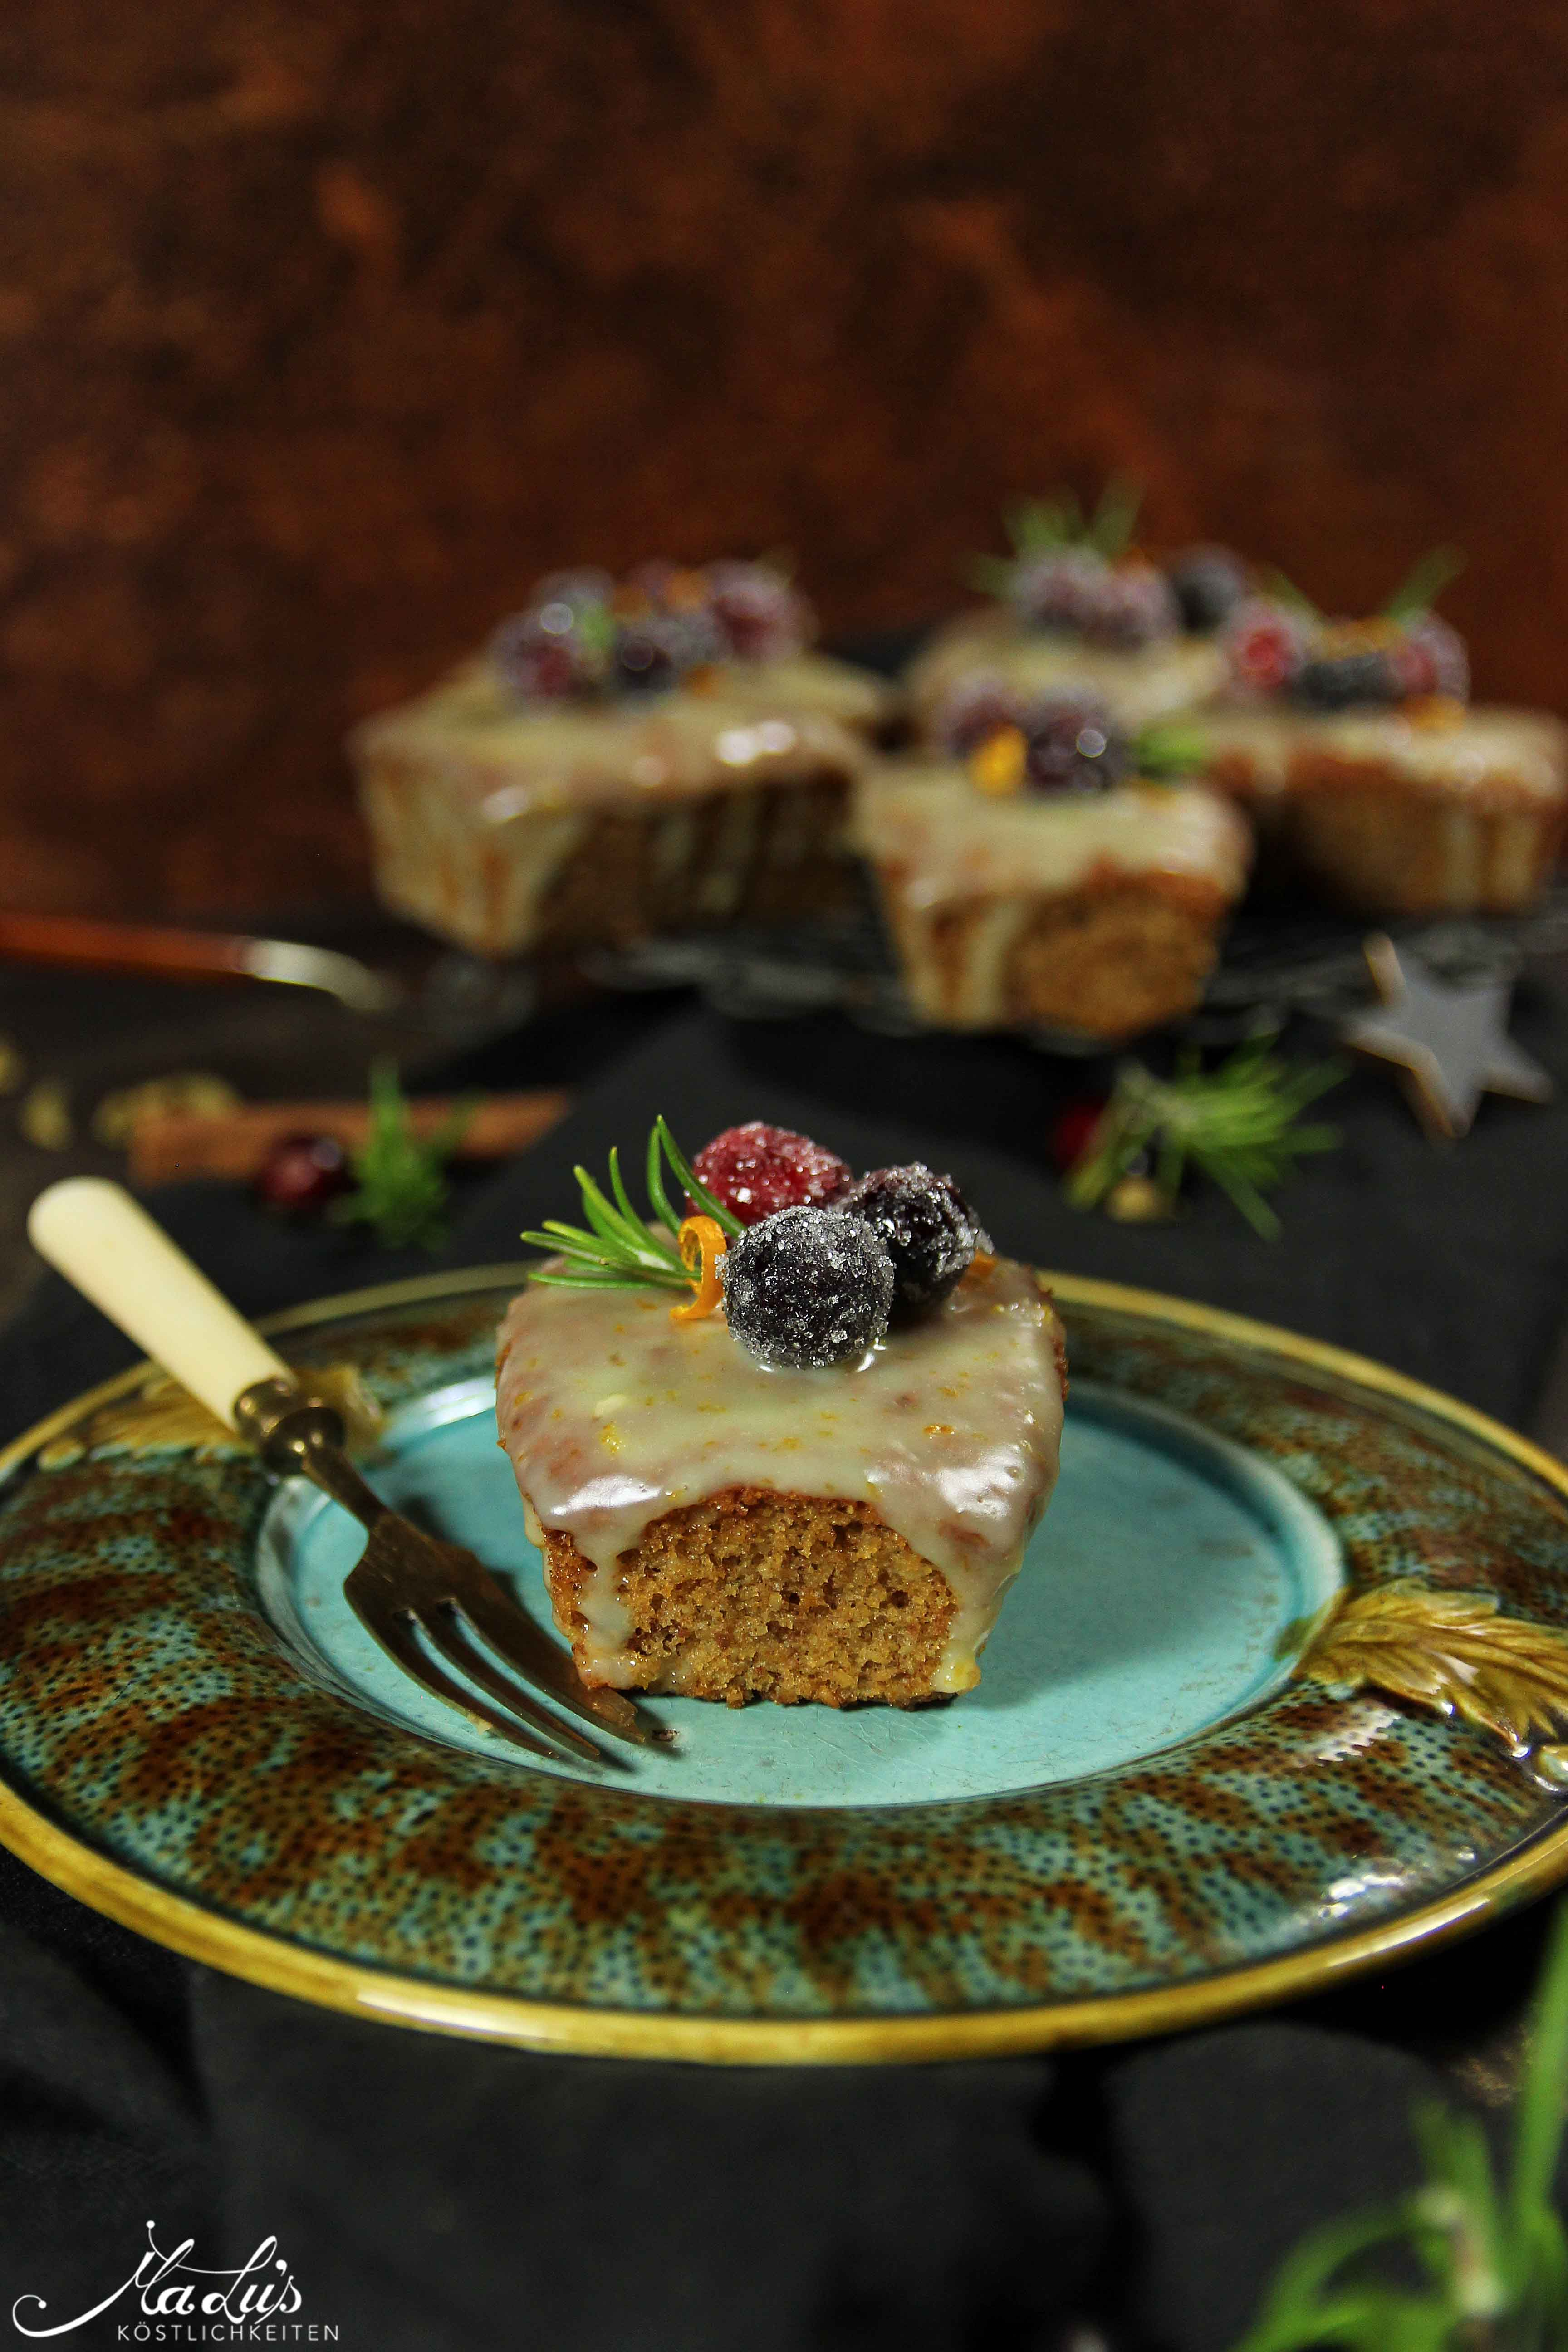 Spiced honey cakes